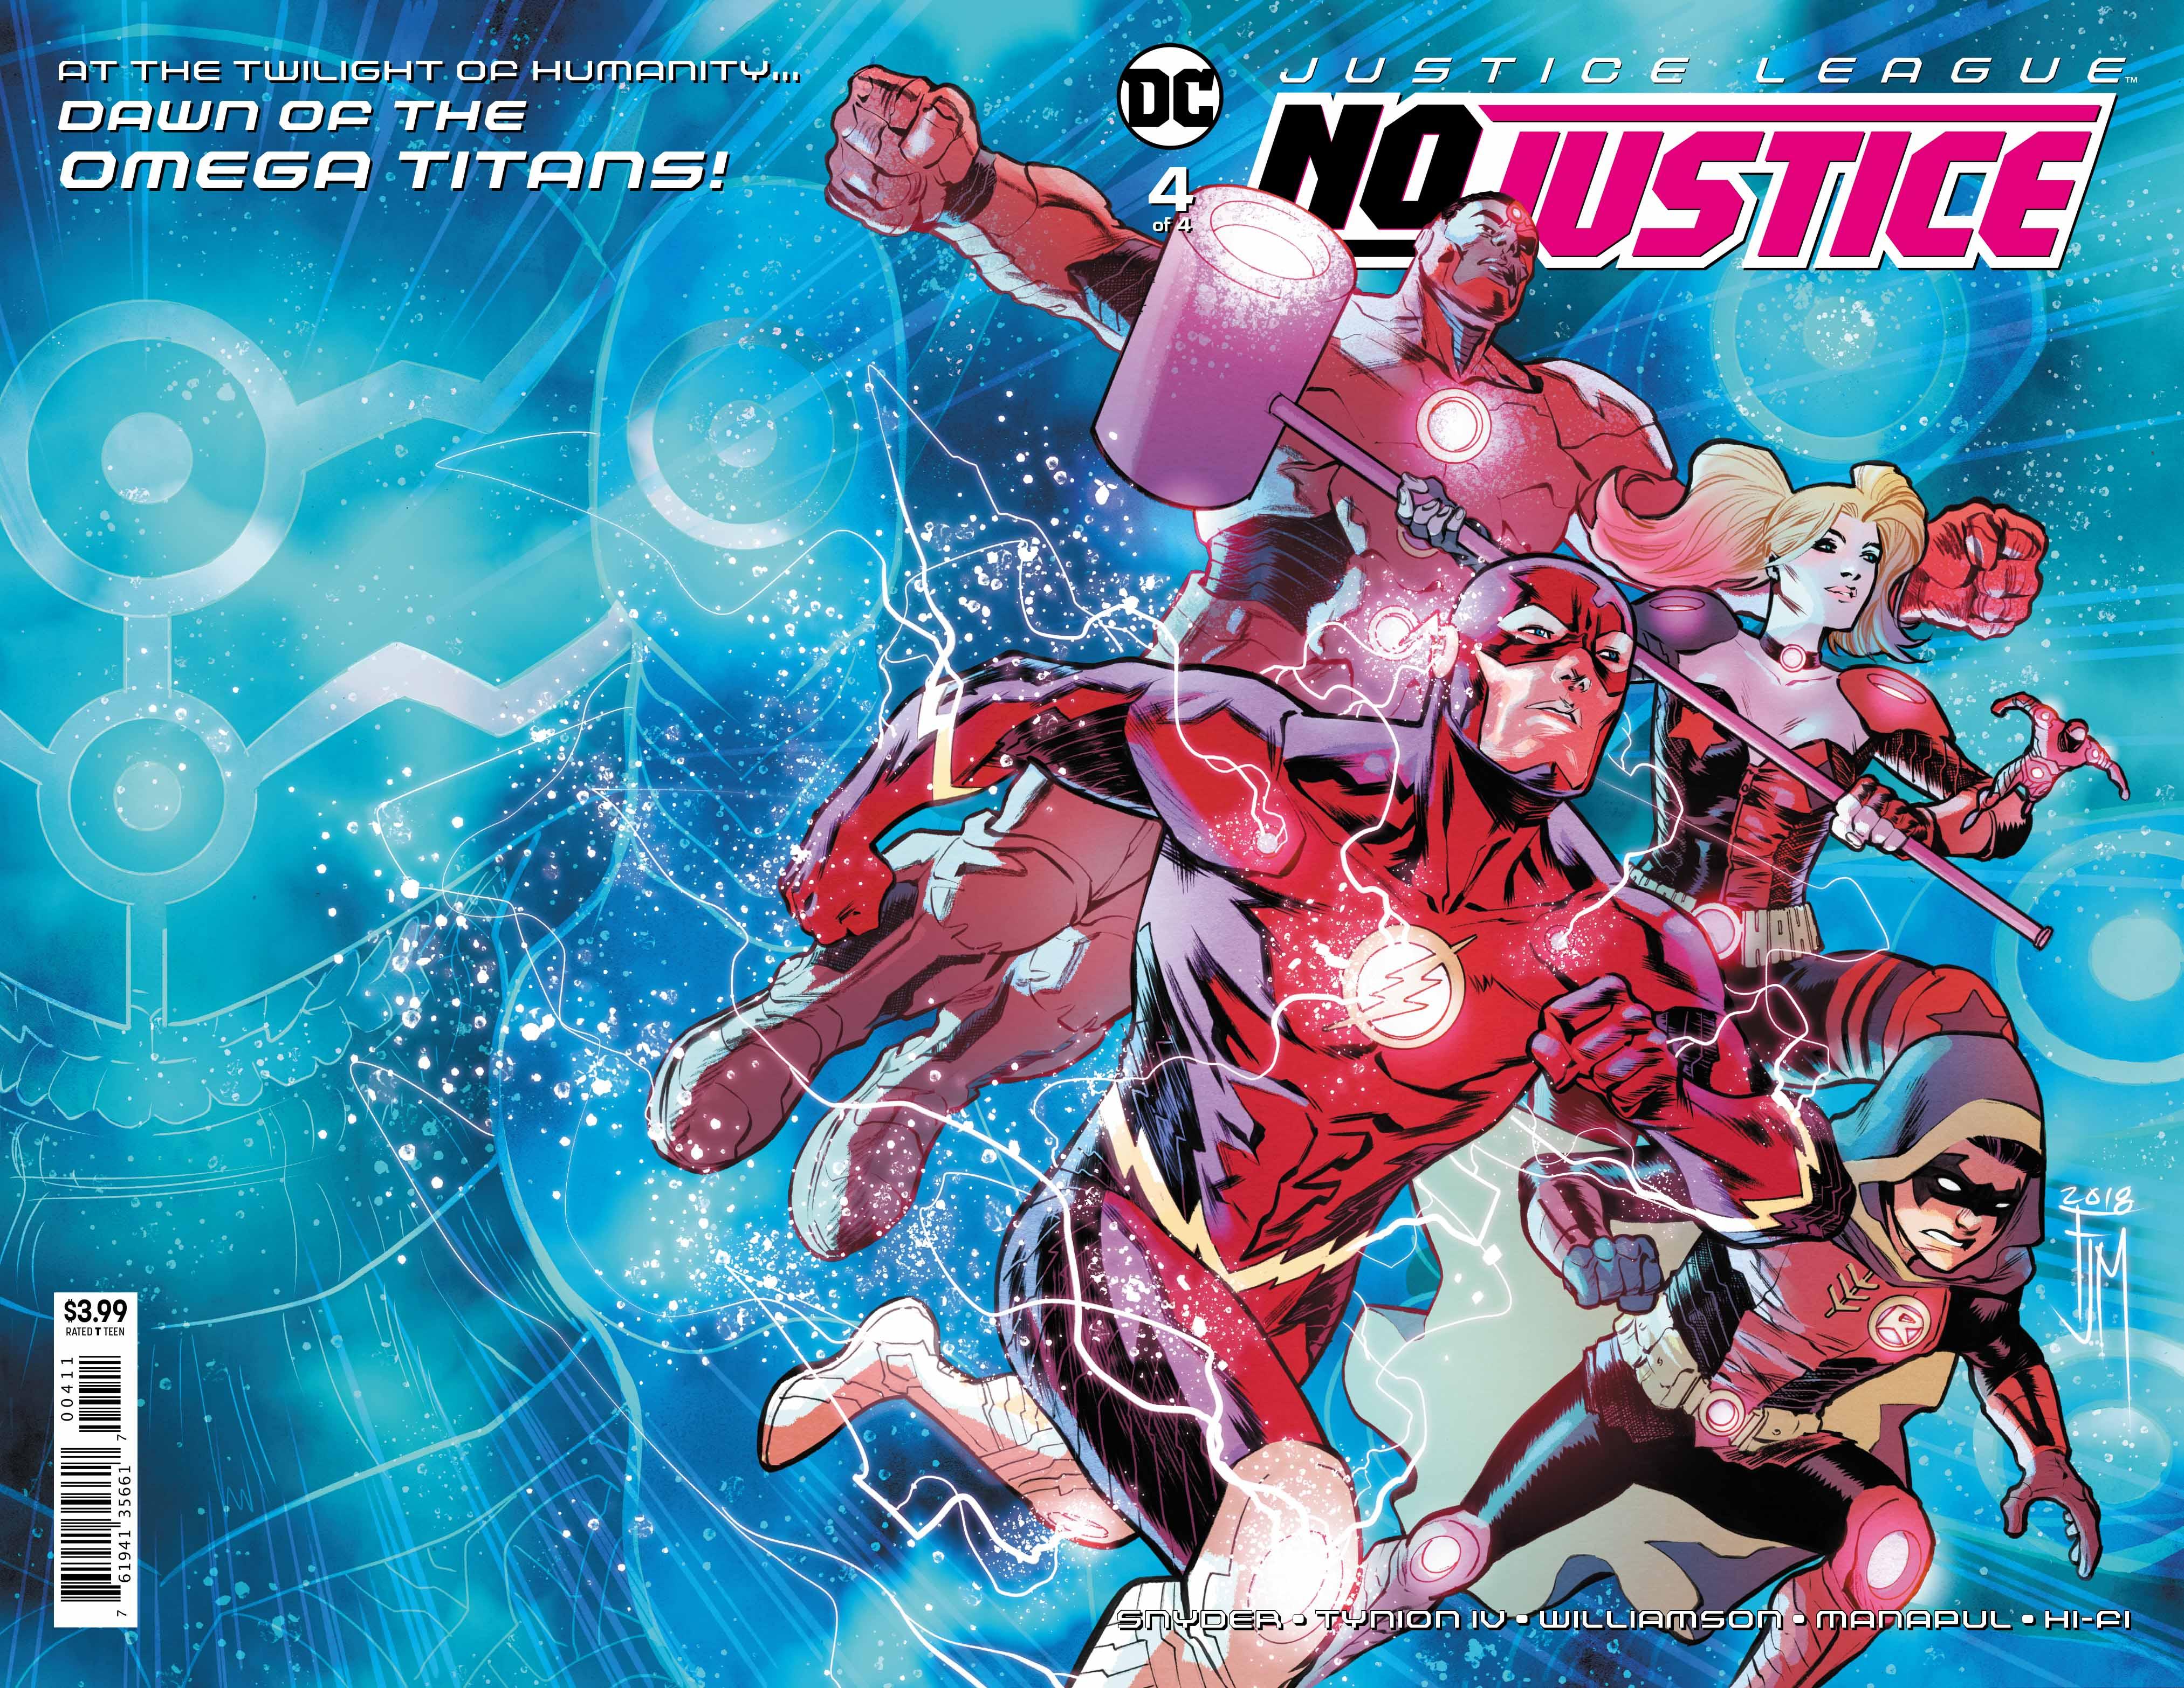 Justice League: No Justice #4 Review